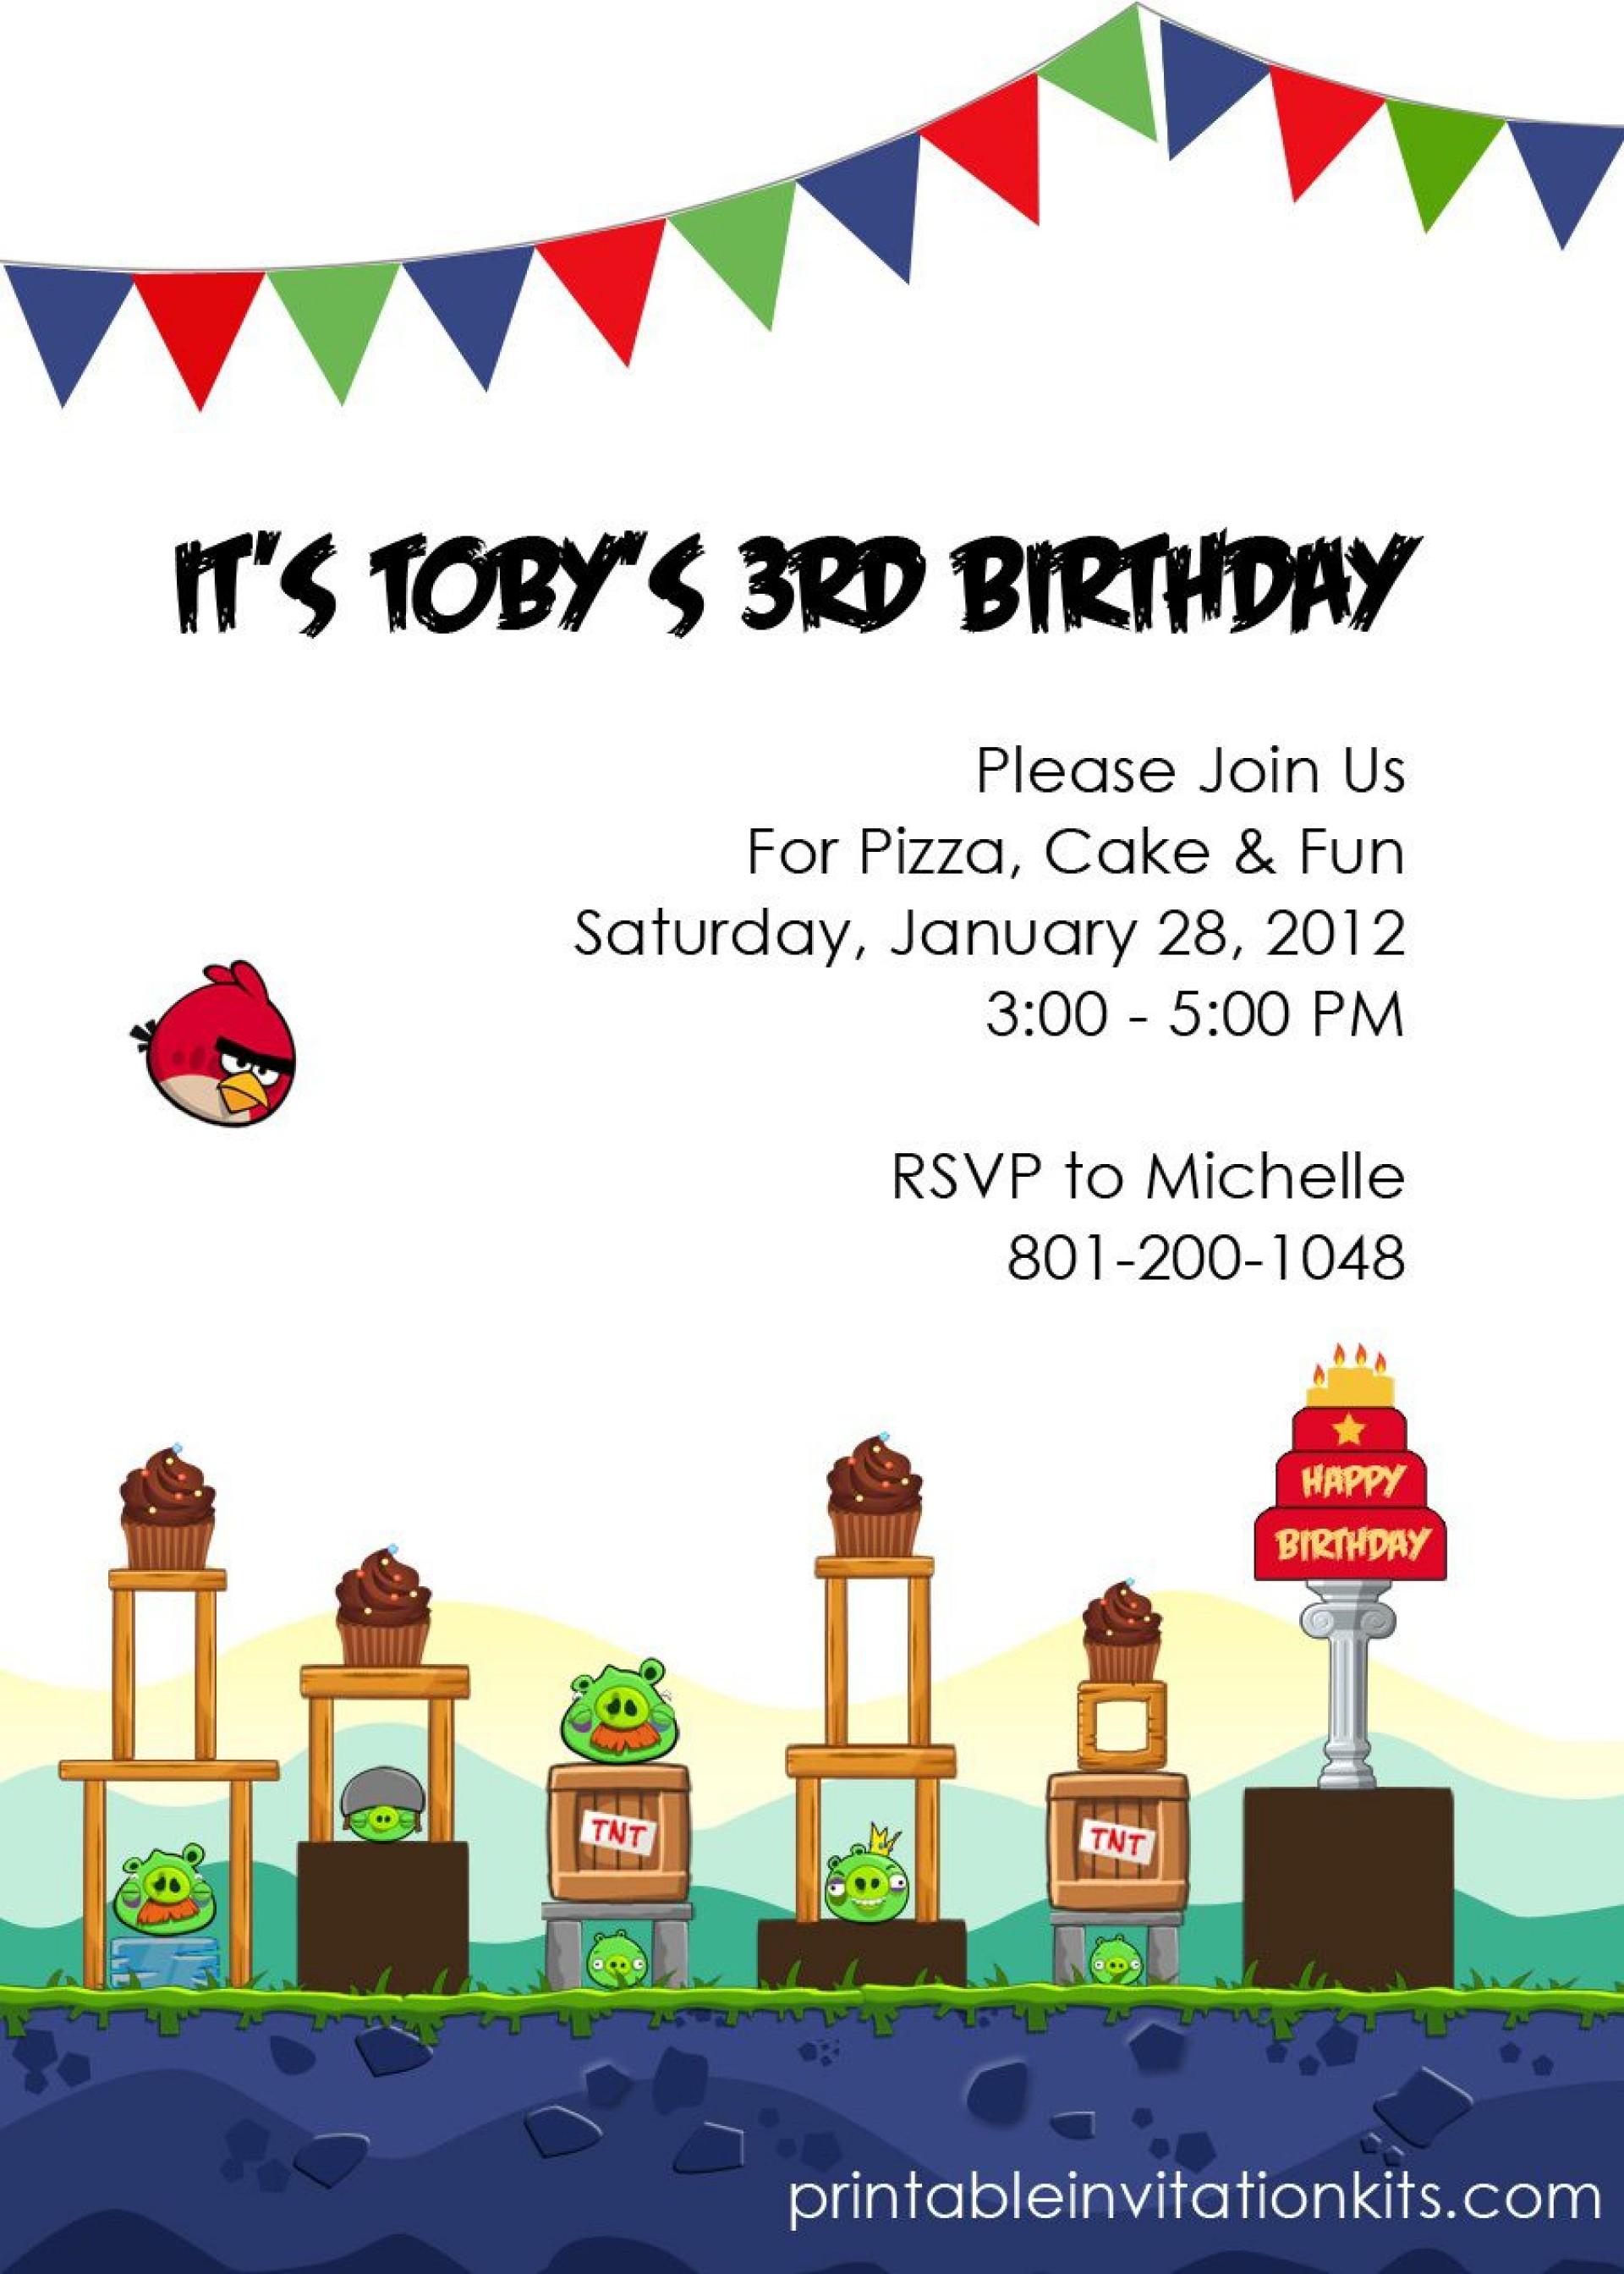 004 Excellent Birthday Party Invitation Template Word Free Idea  Download Invite1920